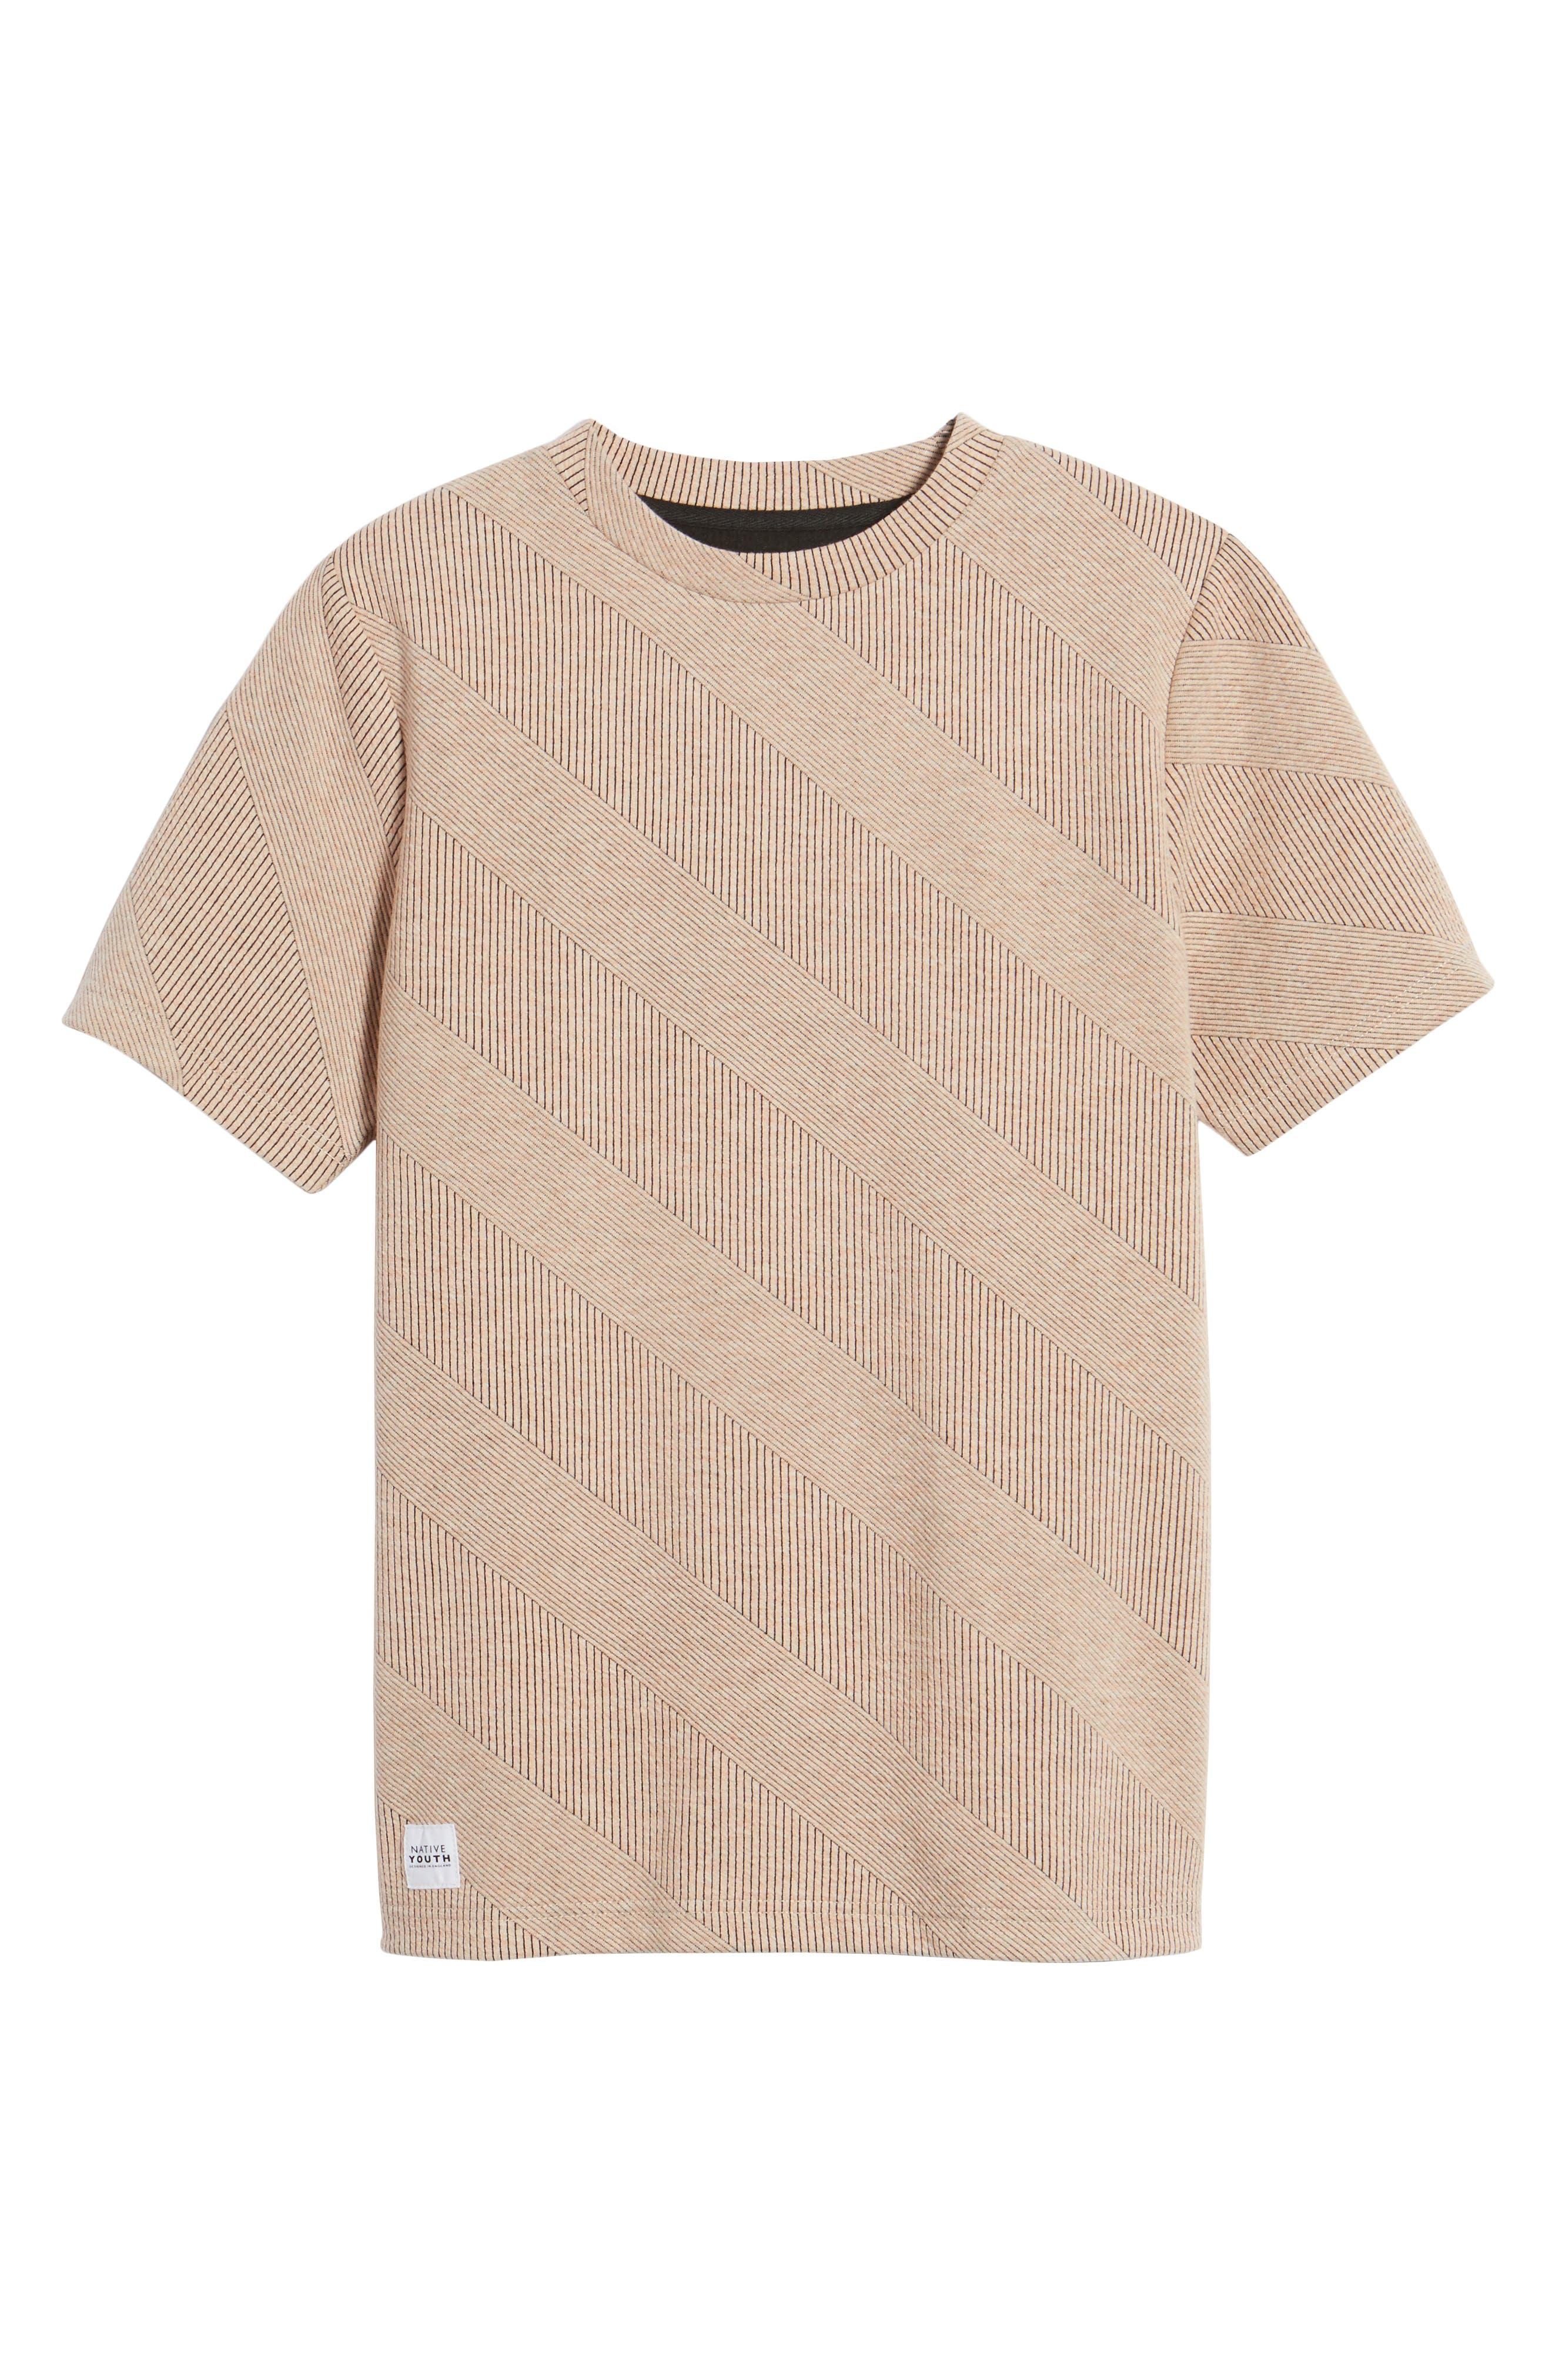 Biota T-Shirt,                             Alternate thumbnail 6, color,                             Coral